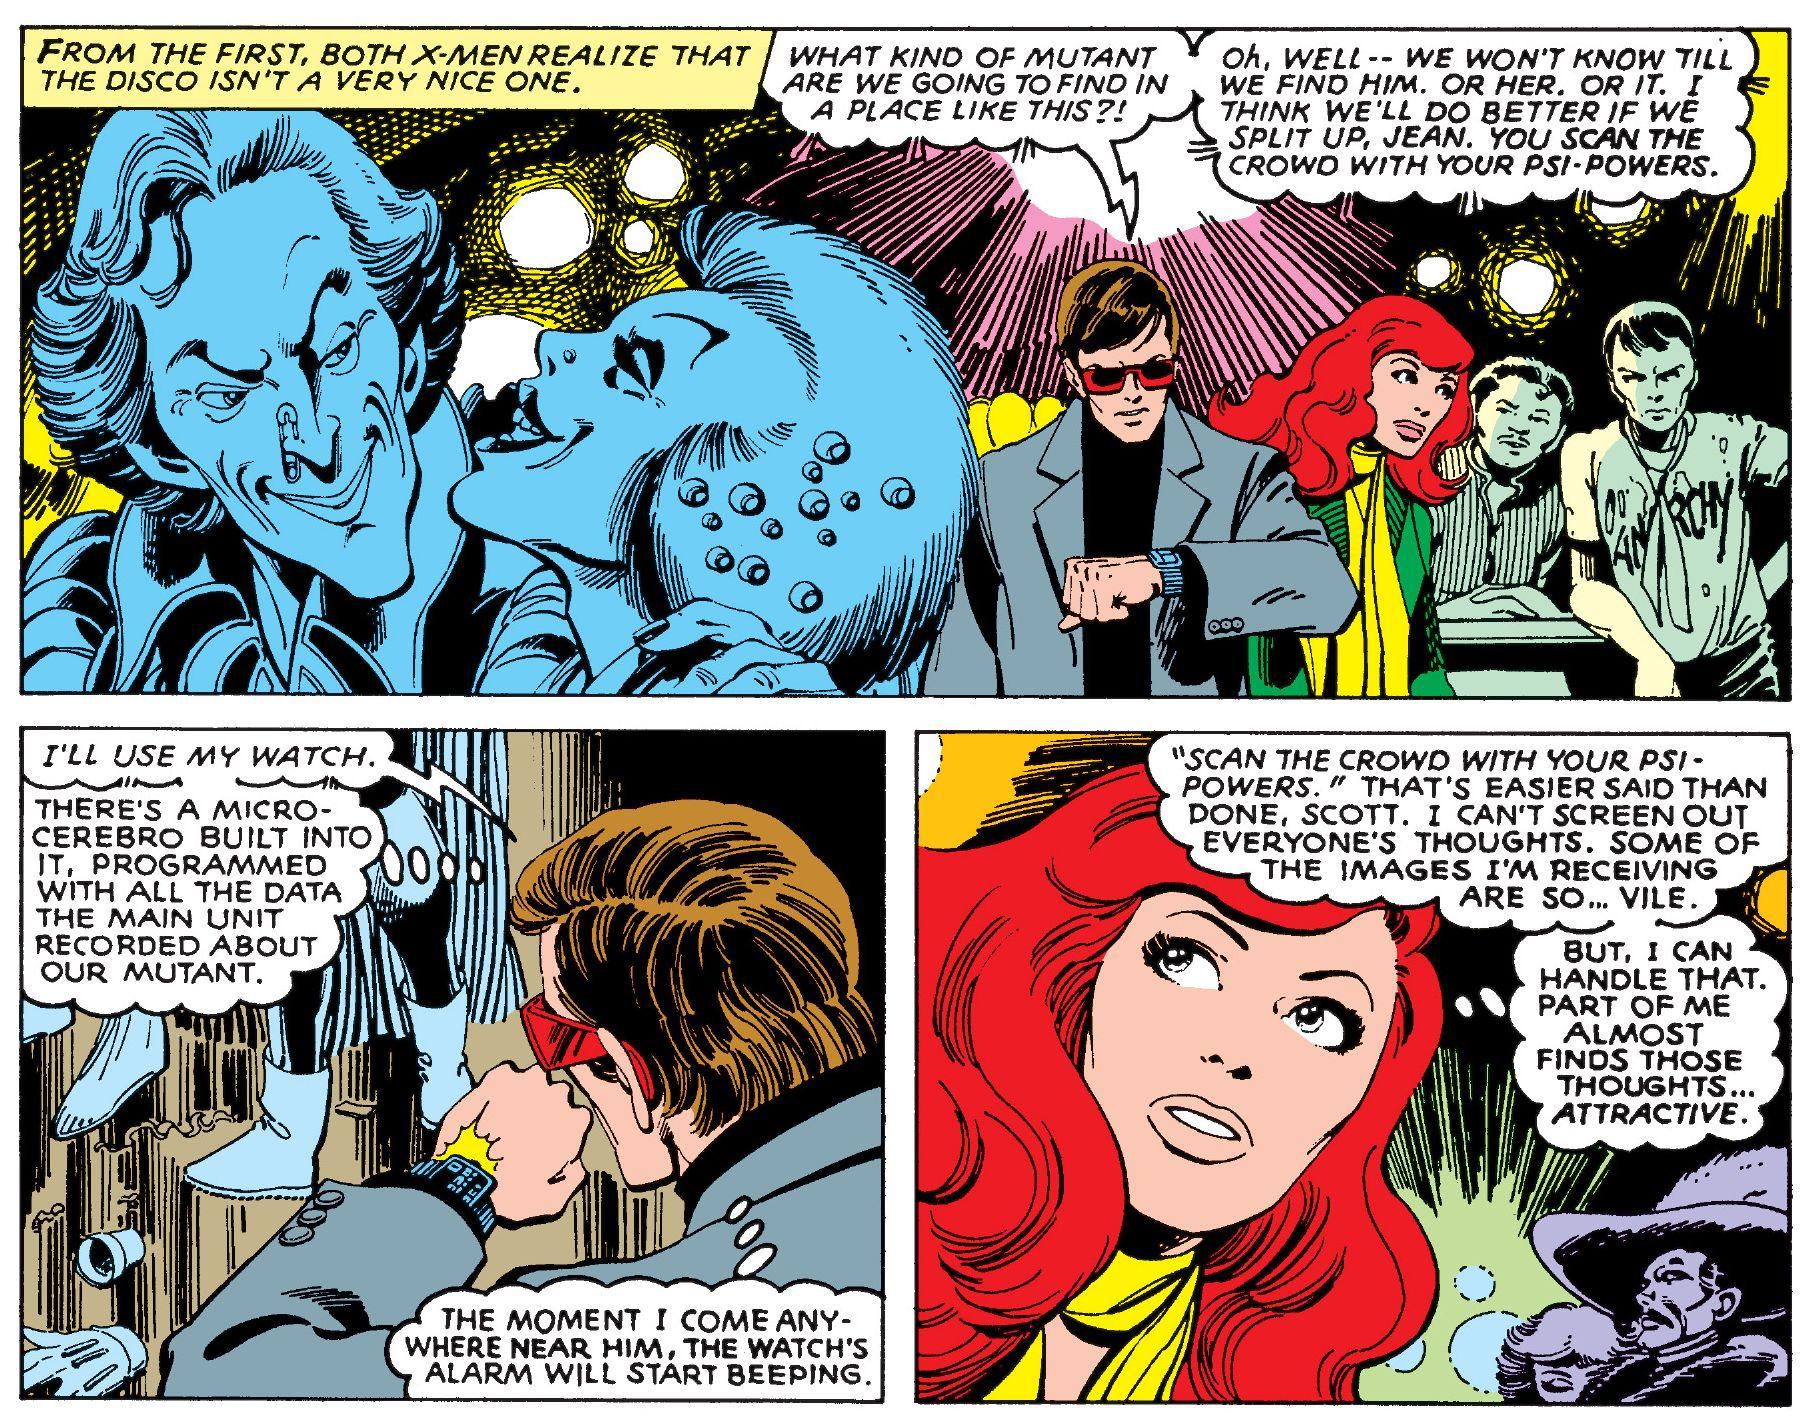 Uncanny X-Men  #130 (Marvel, February 1980), page 5